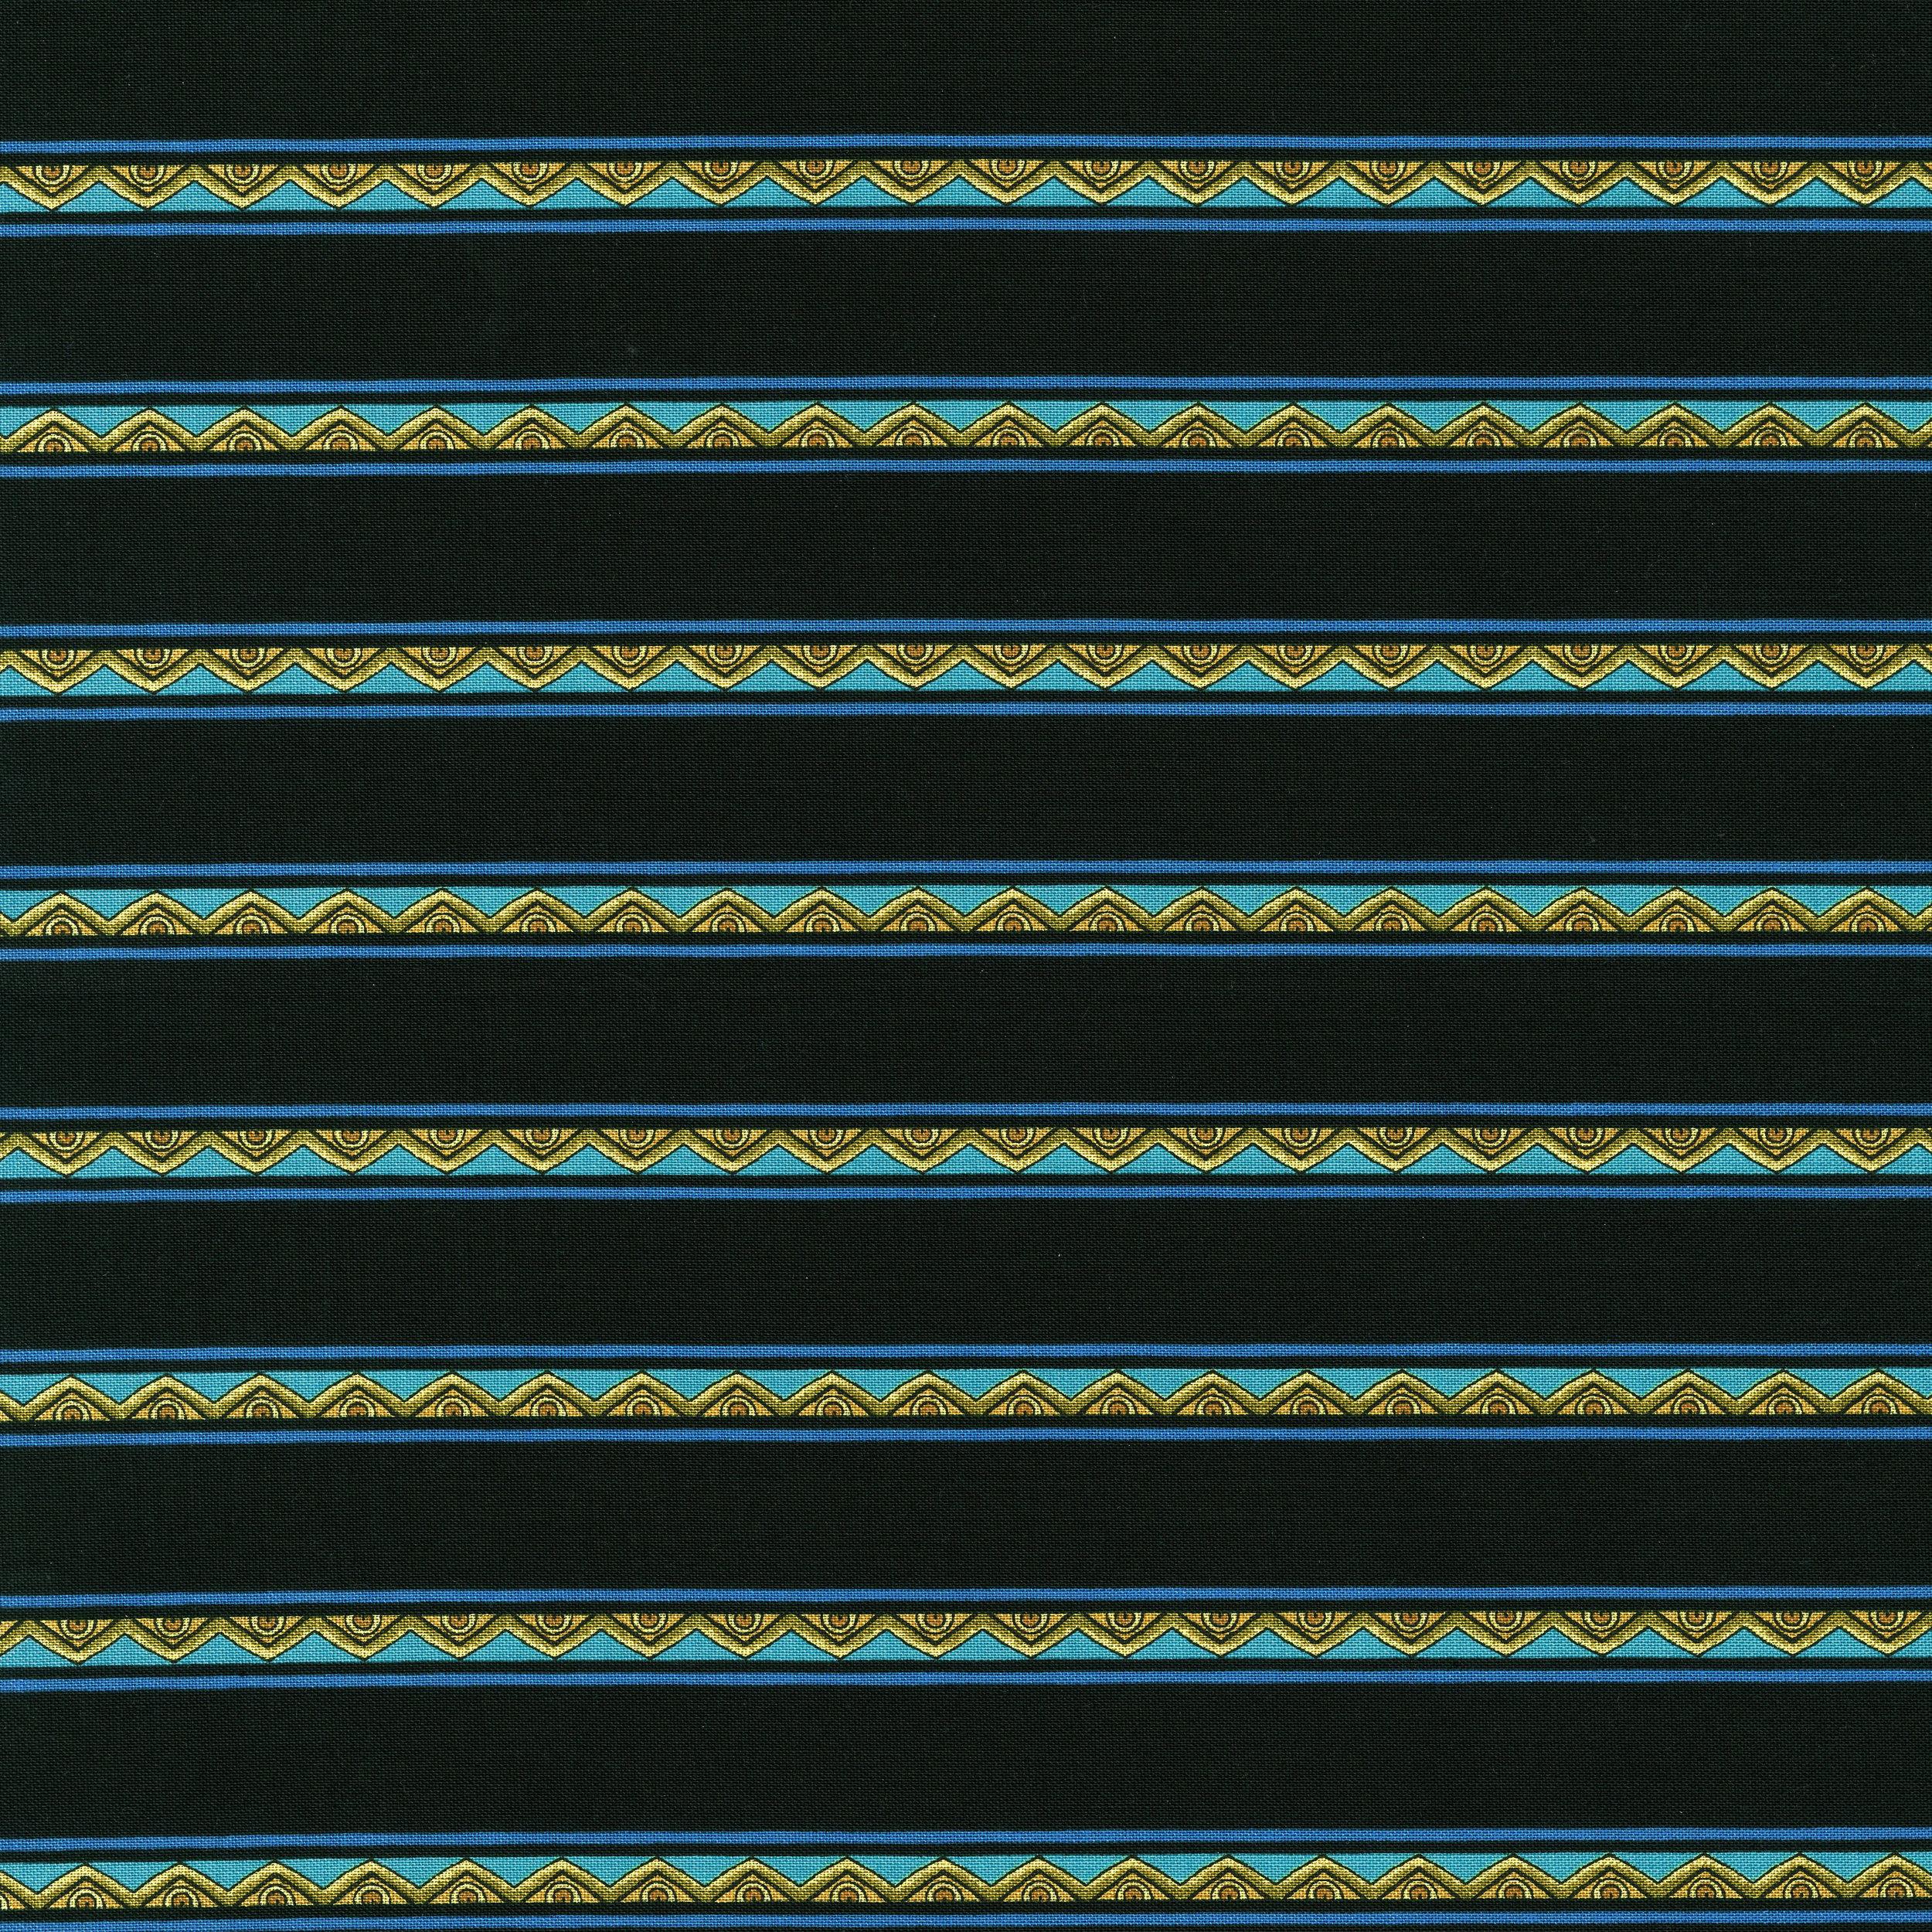 3287-001 MINI STRIPE-TEAL